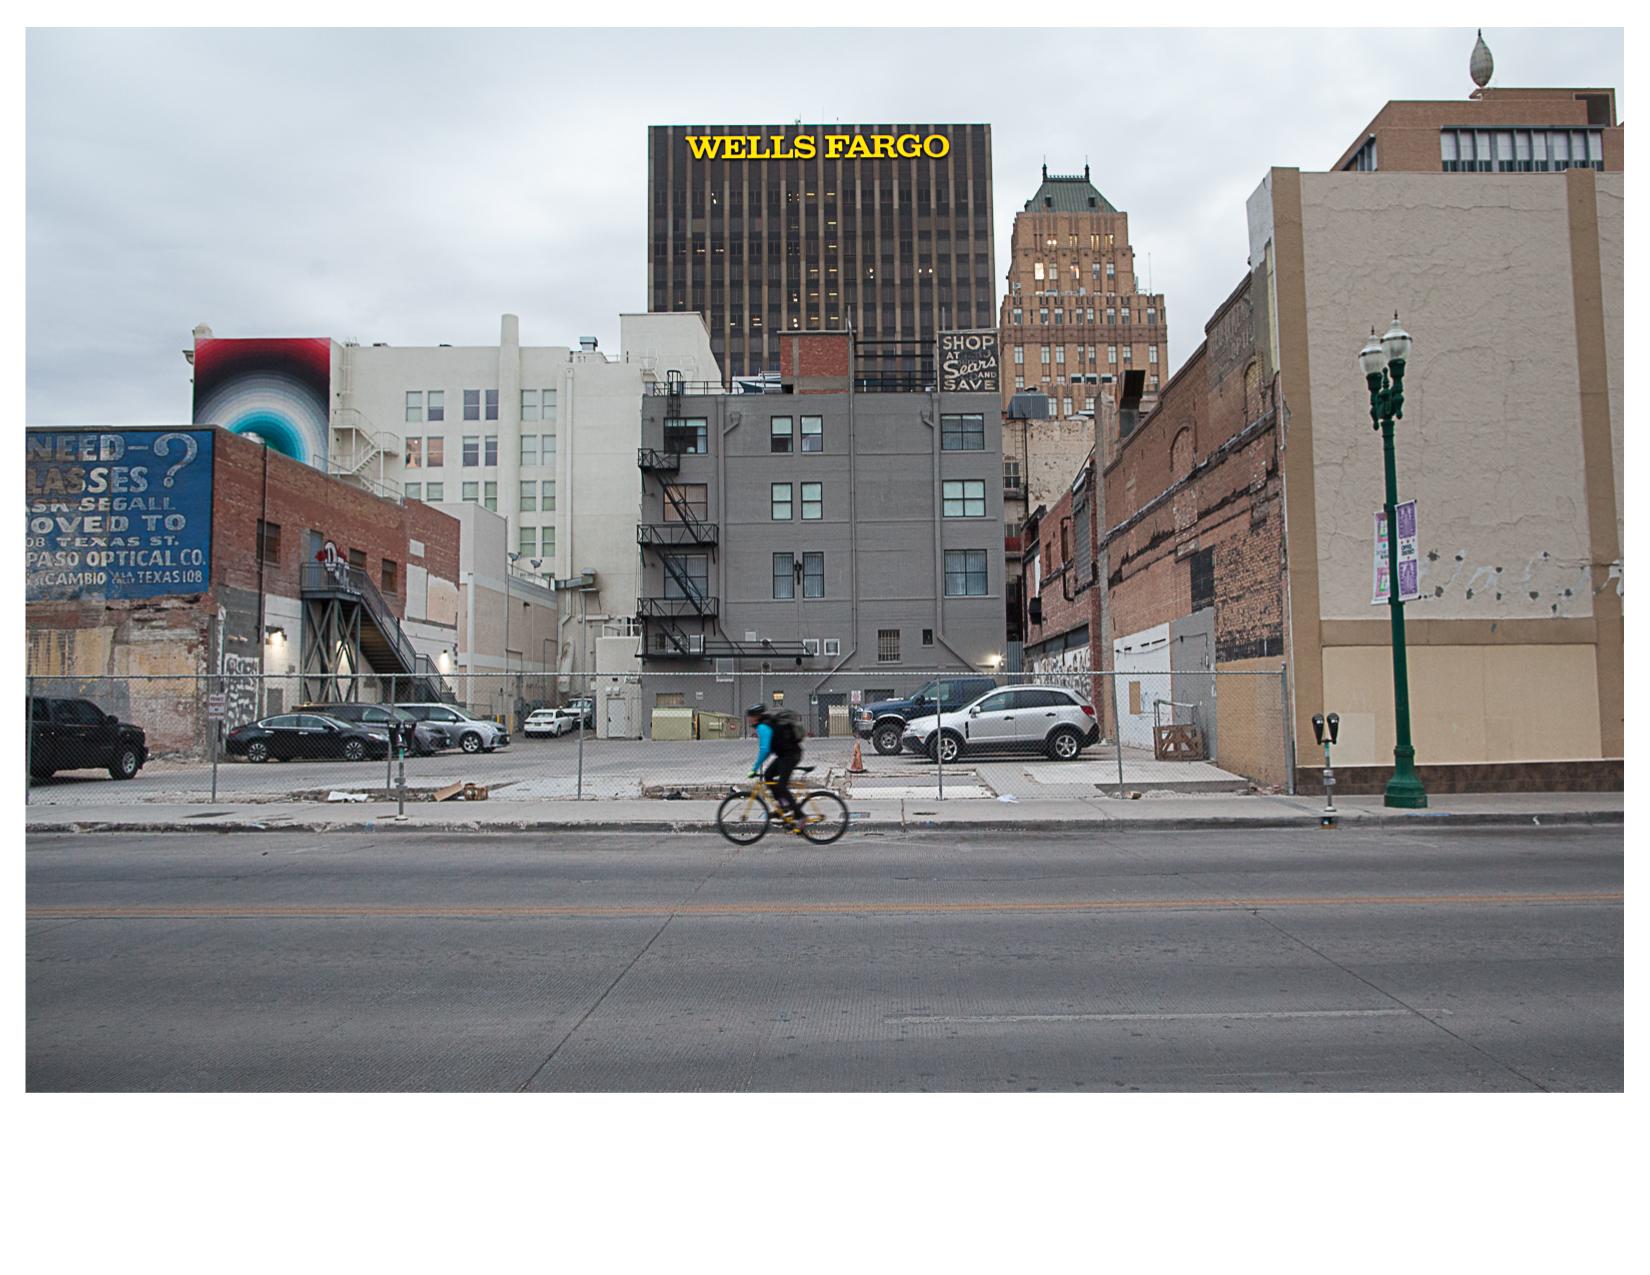 Wells Fargo Building, Seen from Mesa Street, El Paso, TX